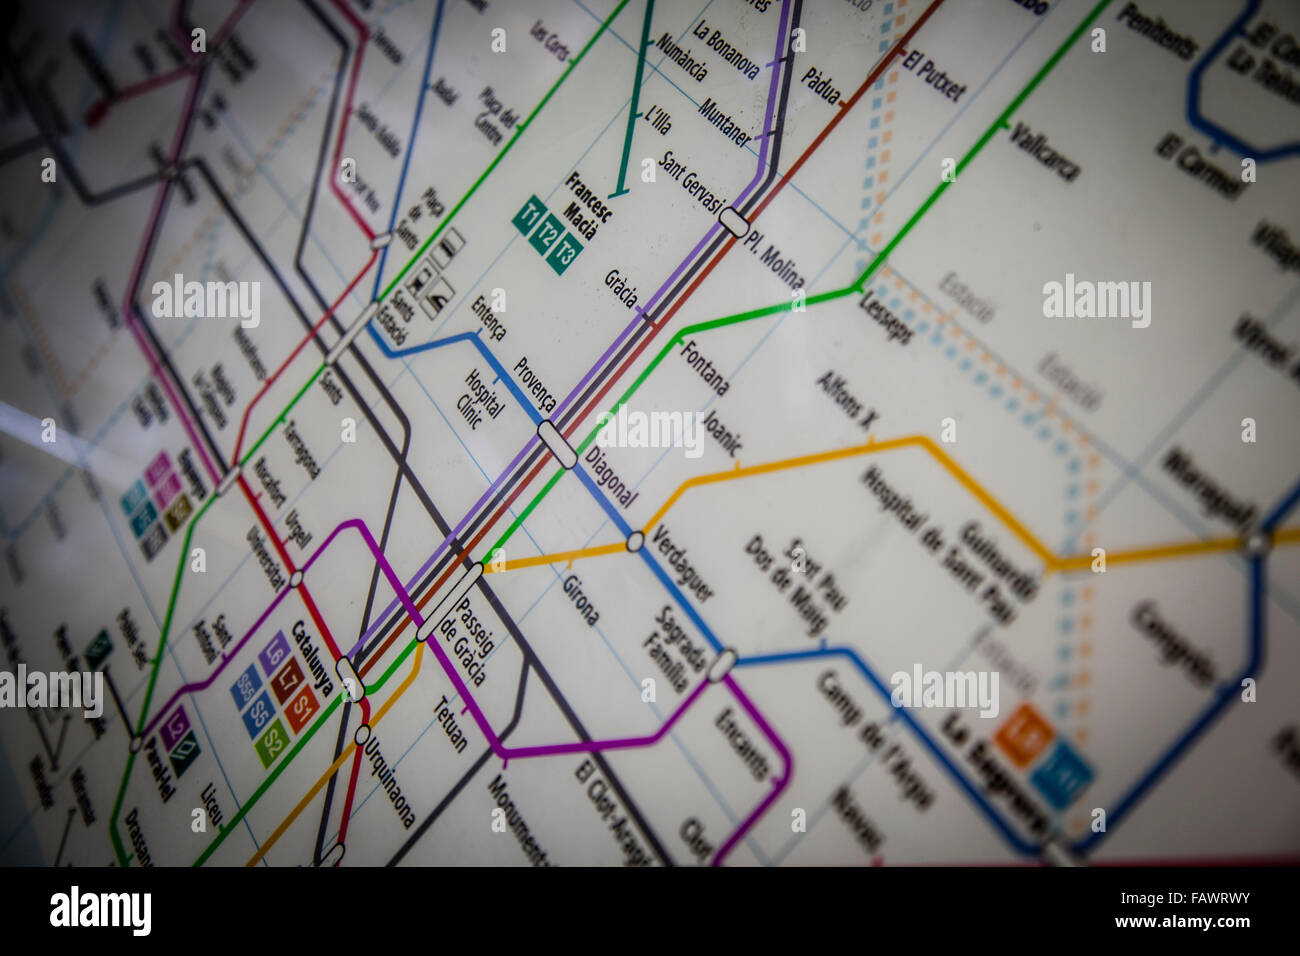 Barcelona's Metro map - Stock Image